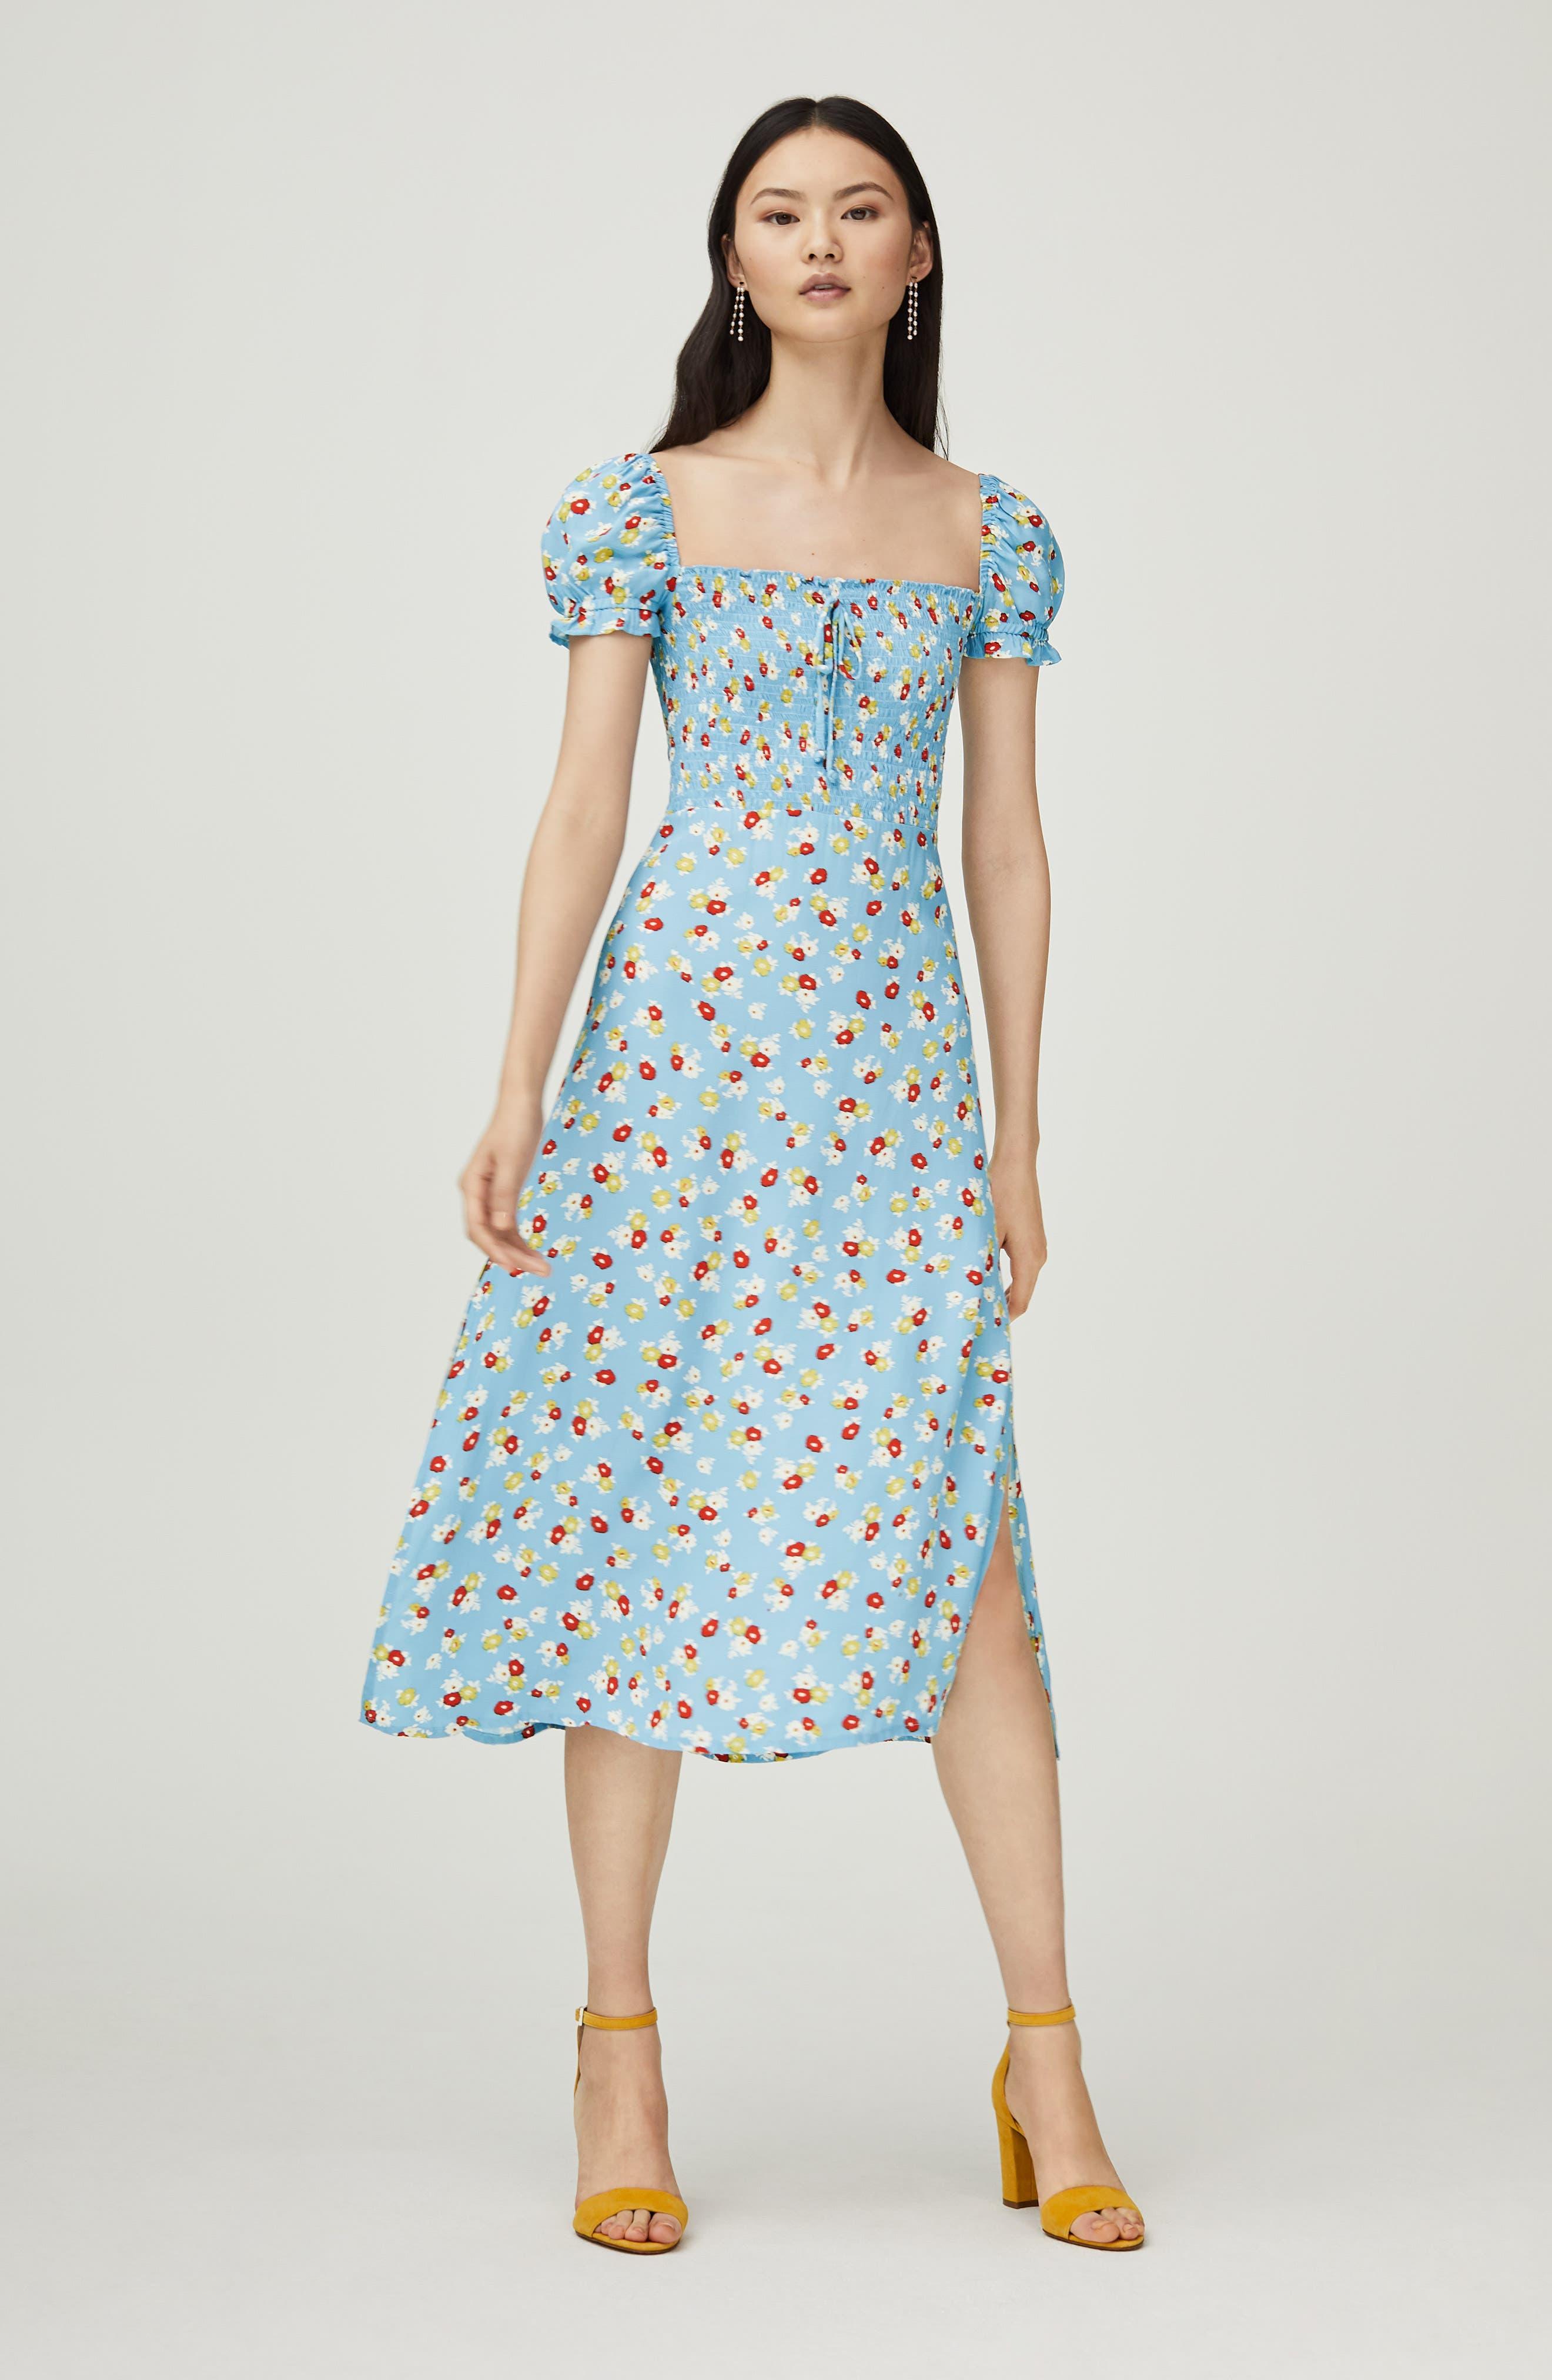 FAITHFULL THE BRAND, Castilo Jasmin Midi Dress, Alternate thumbnail 9, color, JASMIN FLORAL PRINT - BLUE